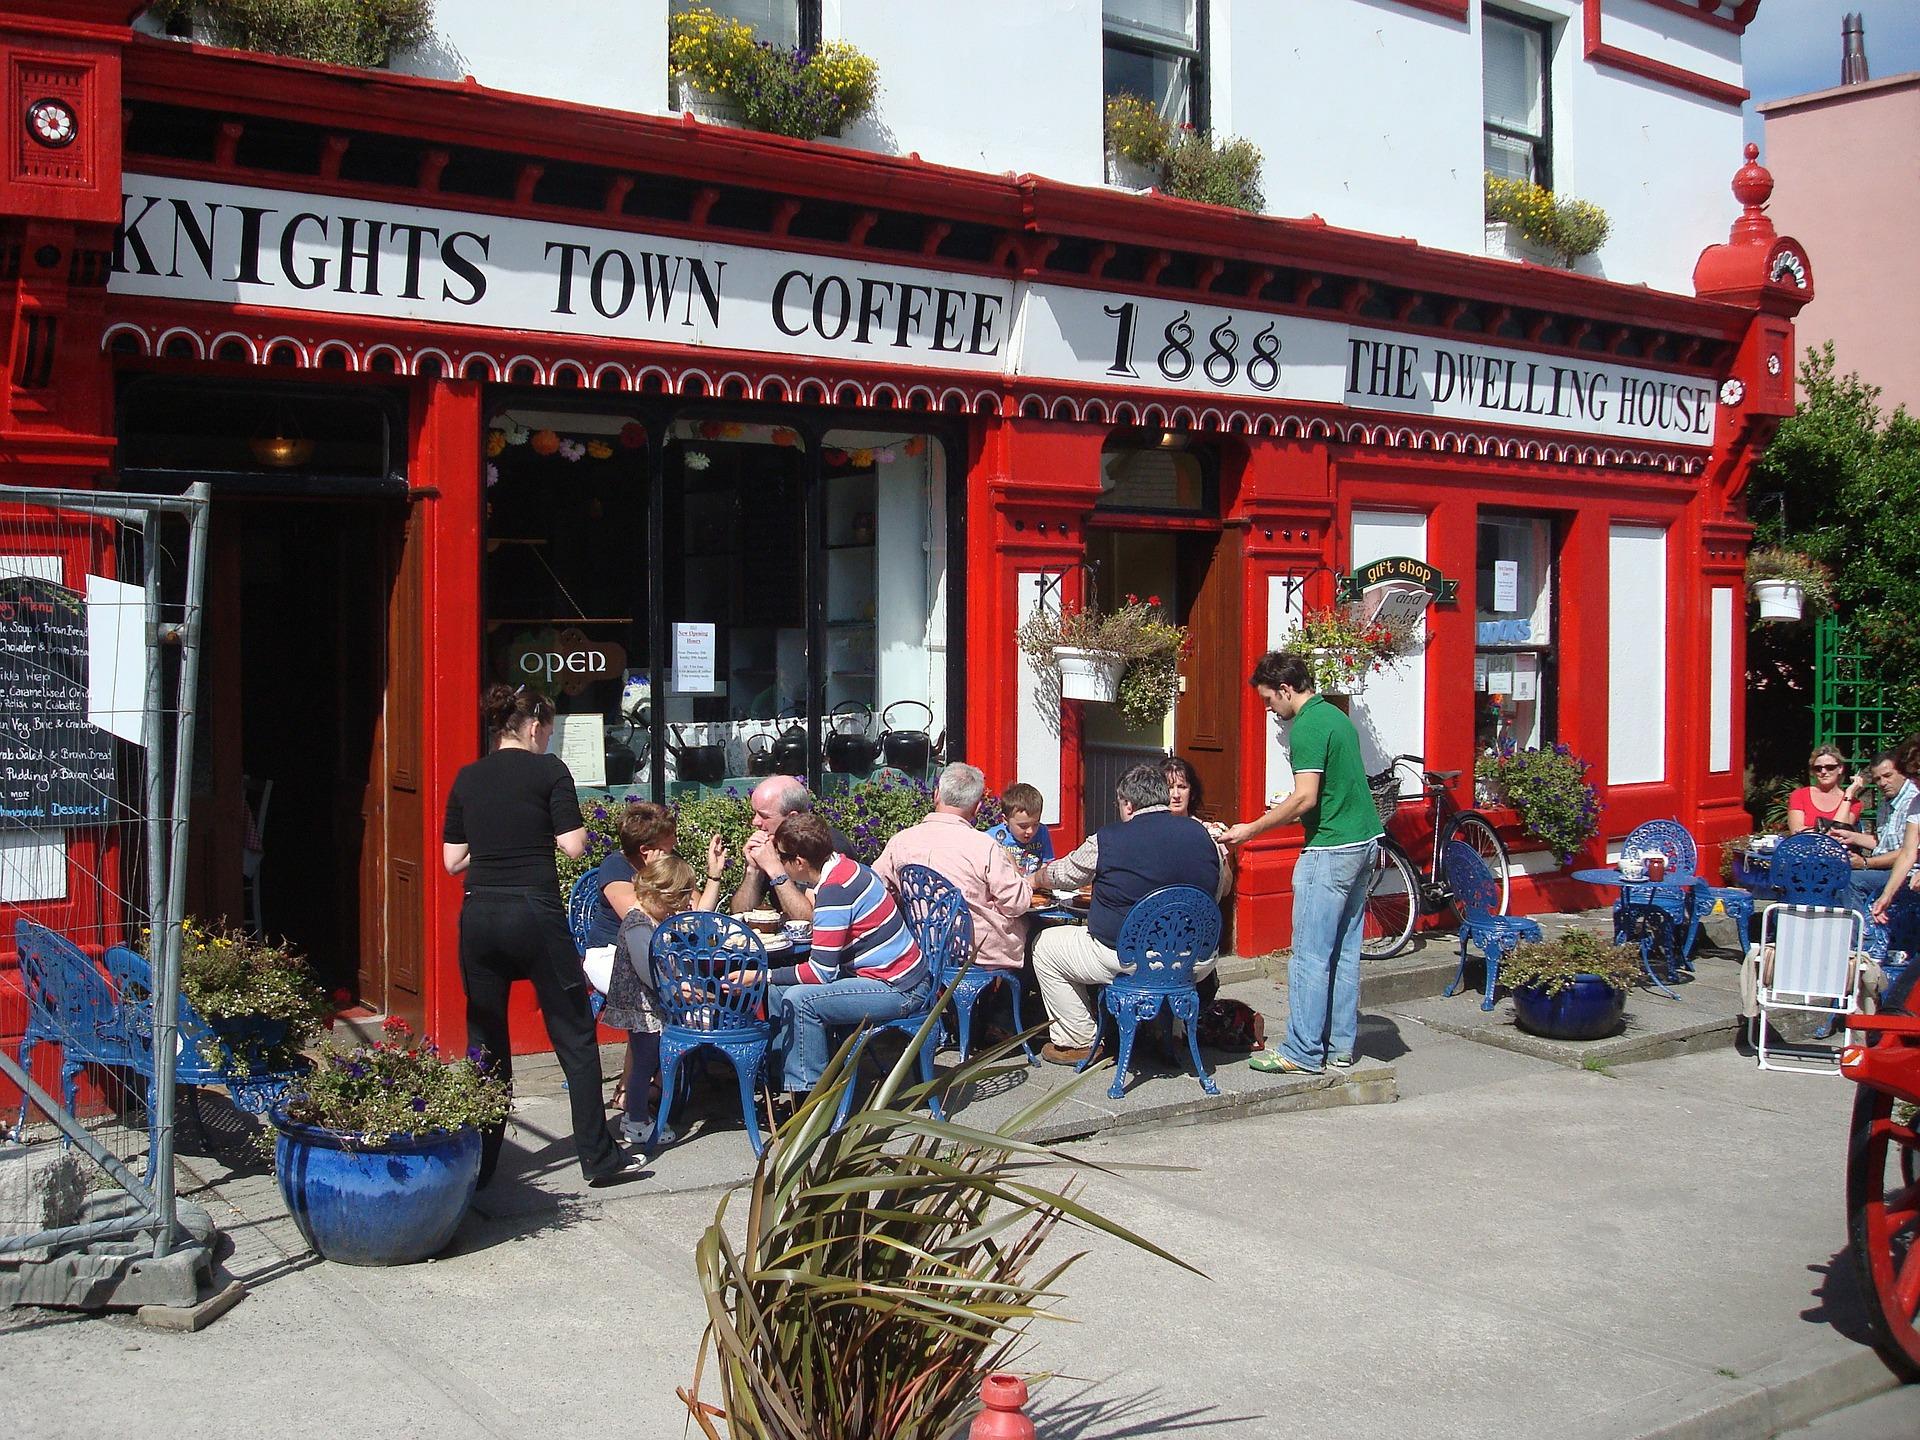 Sidewalk Cafe and Coffee Shop on Velentia Island